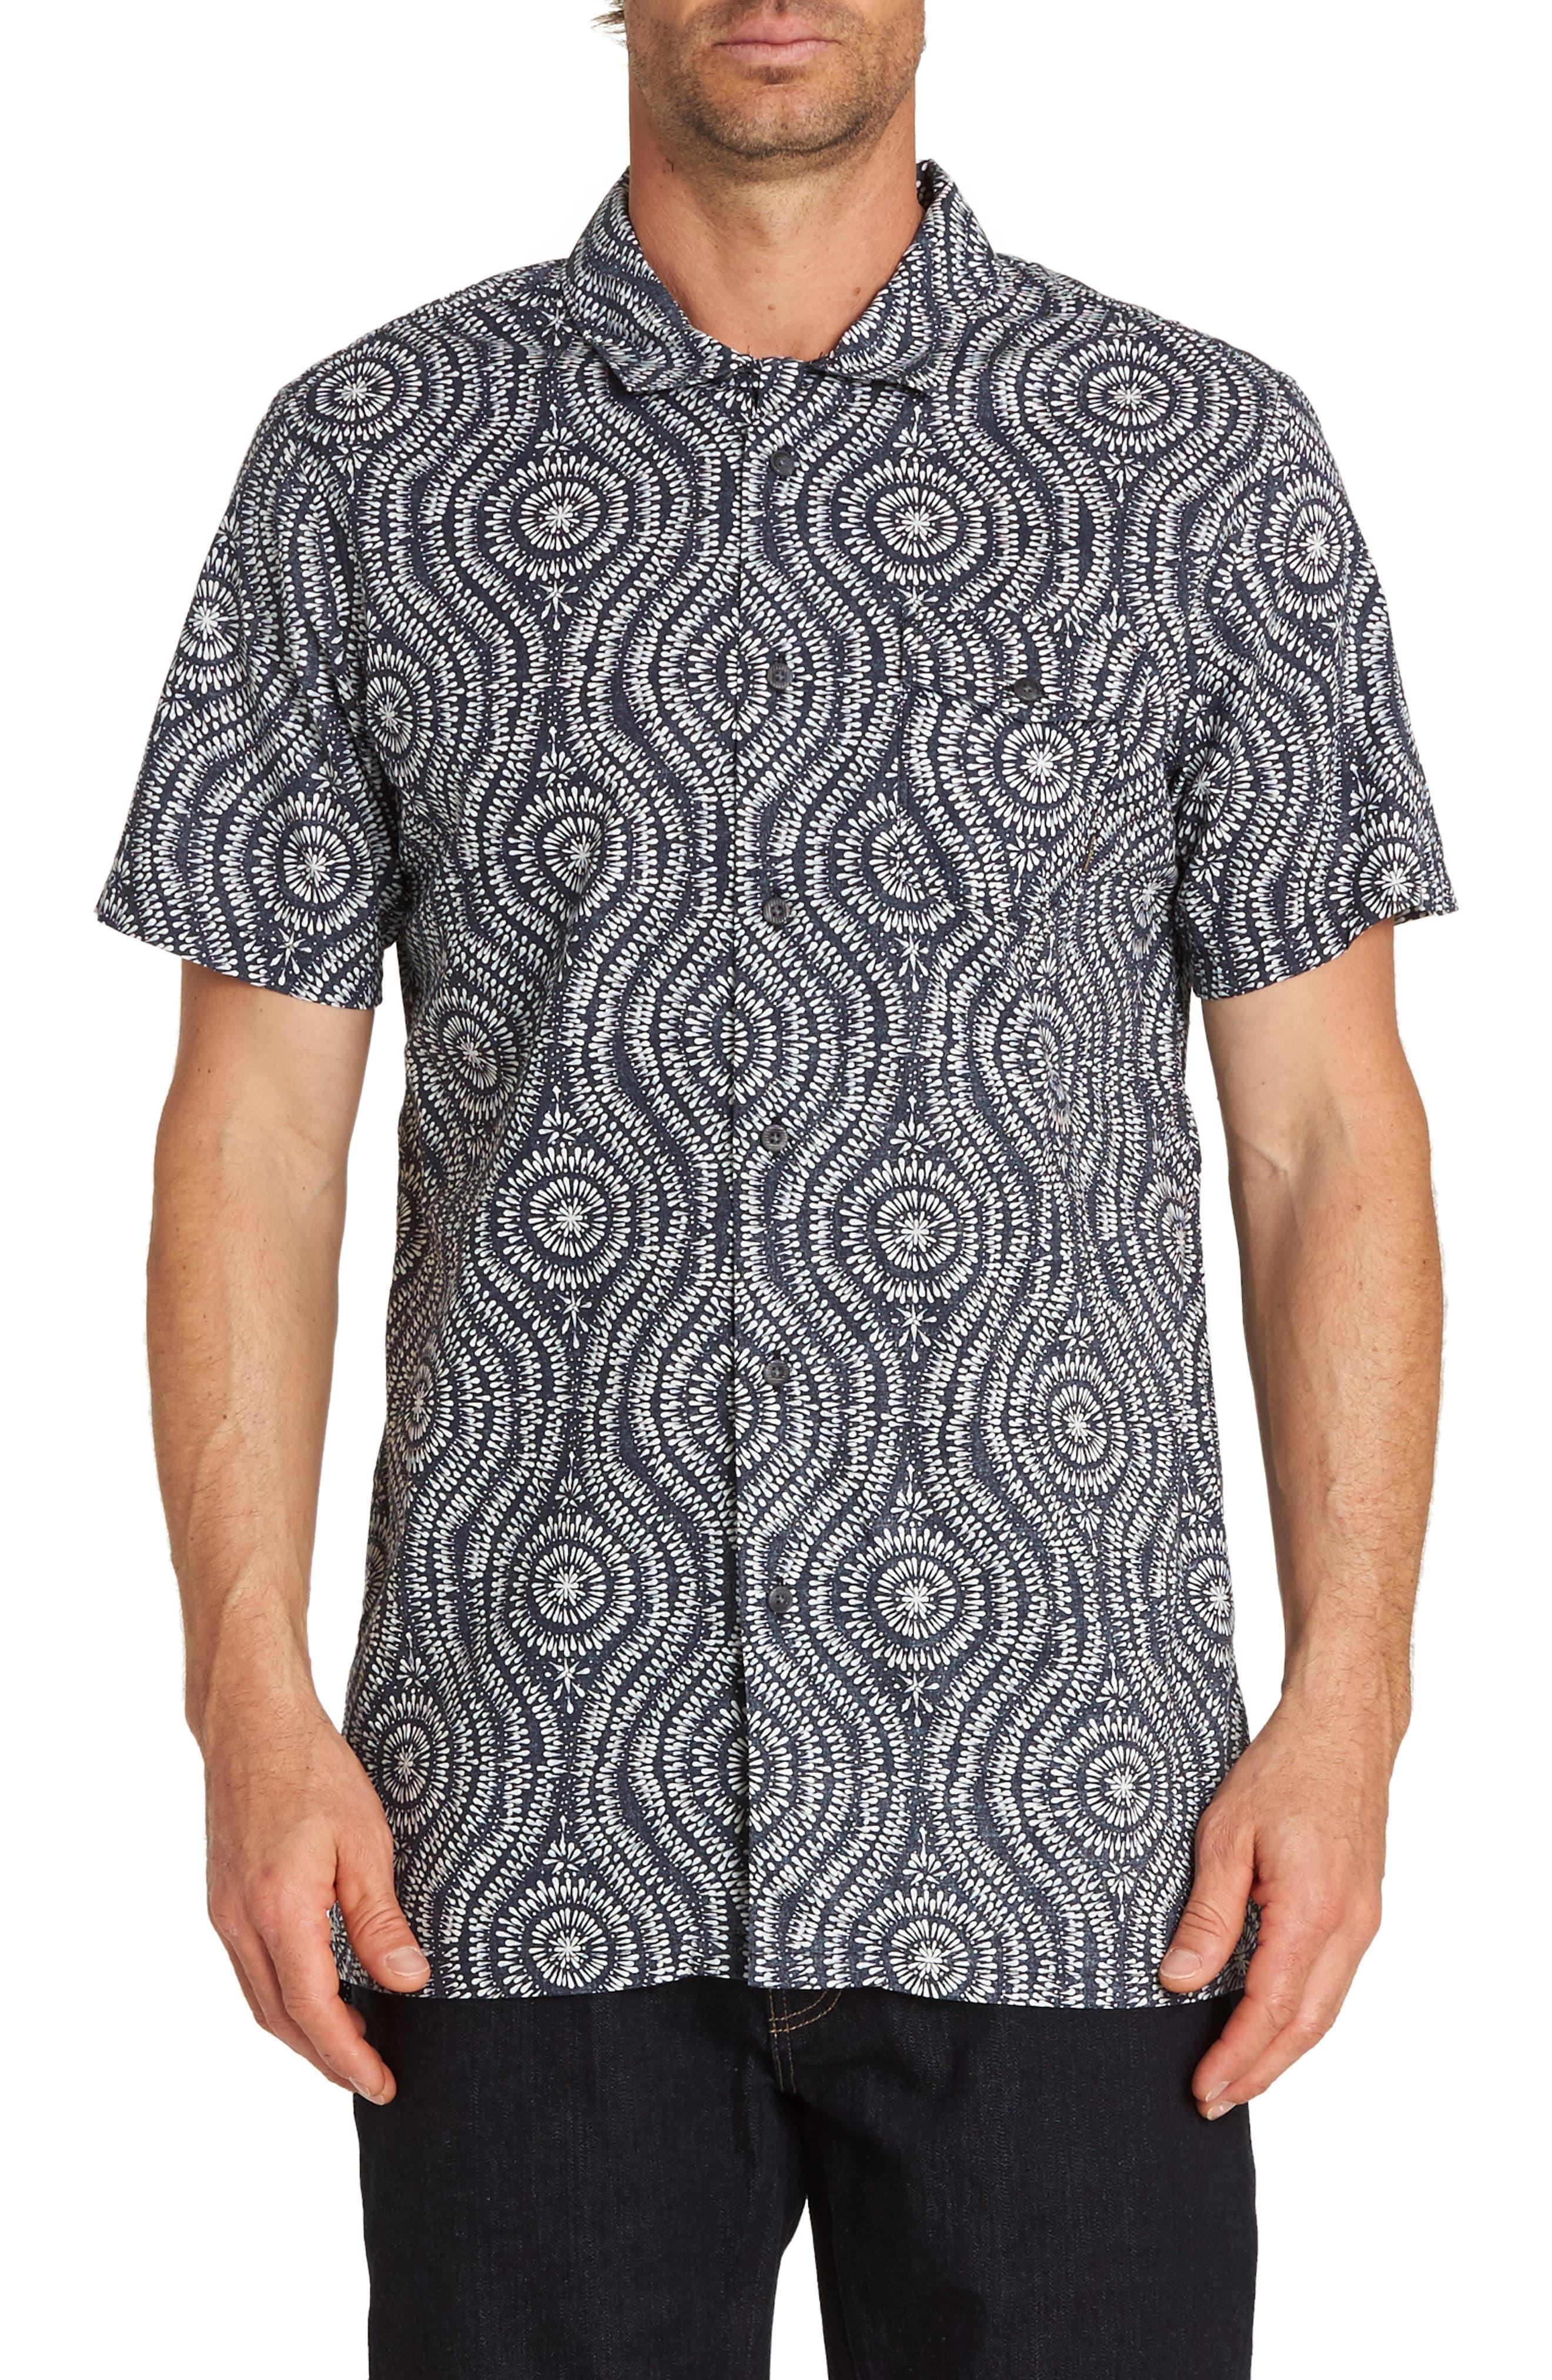 Cosmic Patterned Camp Shirt,                         Main,                         color, INDIGO